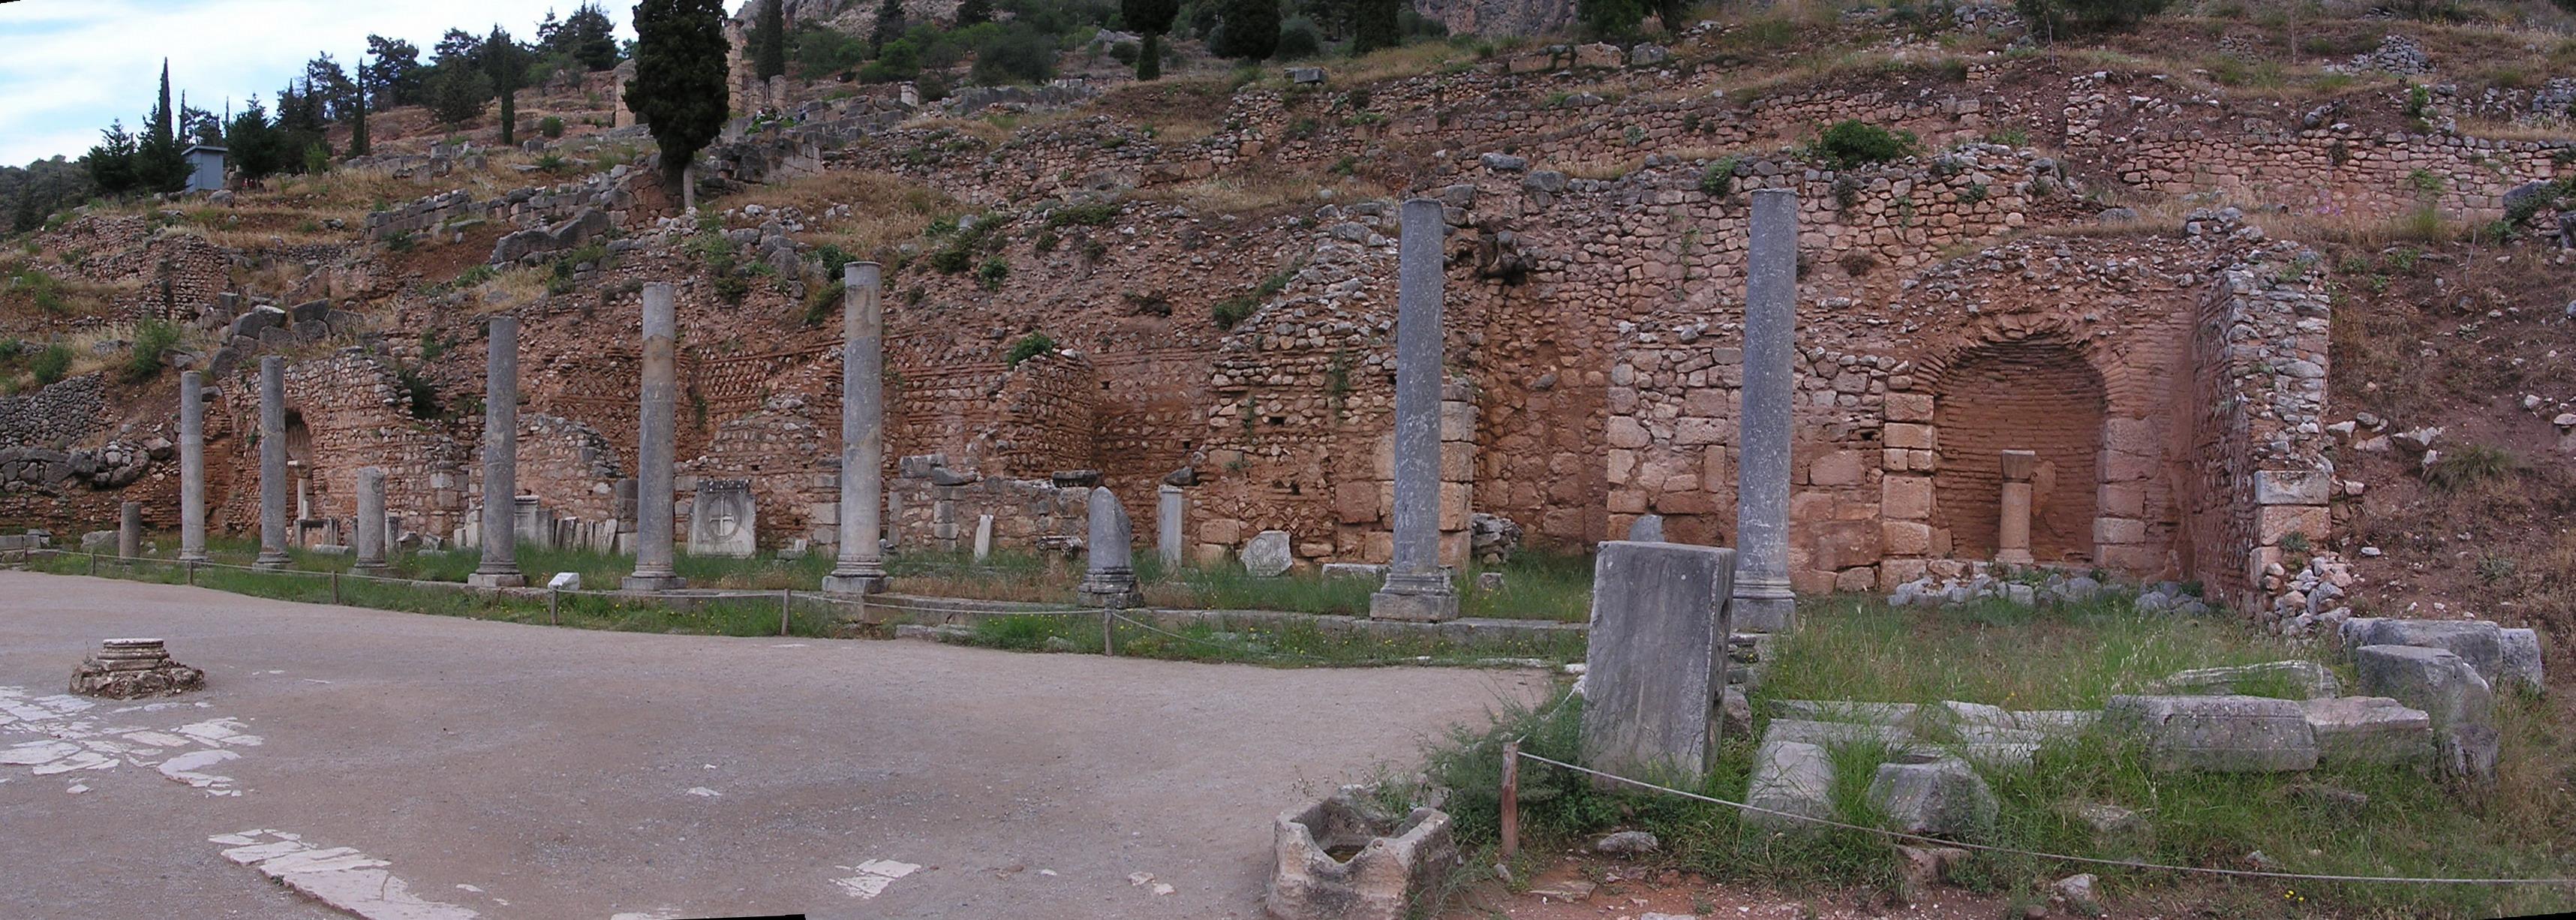 Grecia Oraculo de Delfos Monumento espartano a Egospotamos panoramica 03